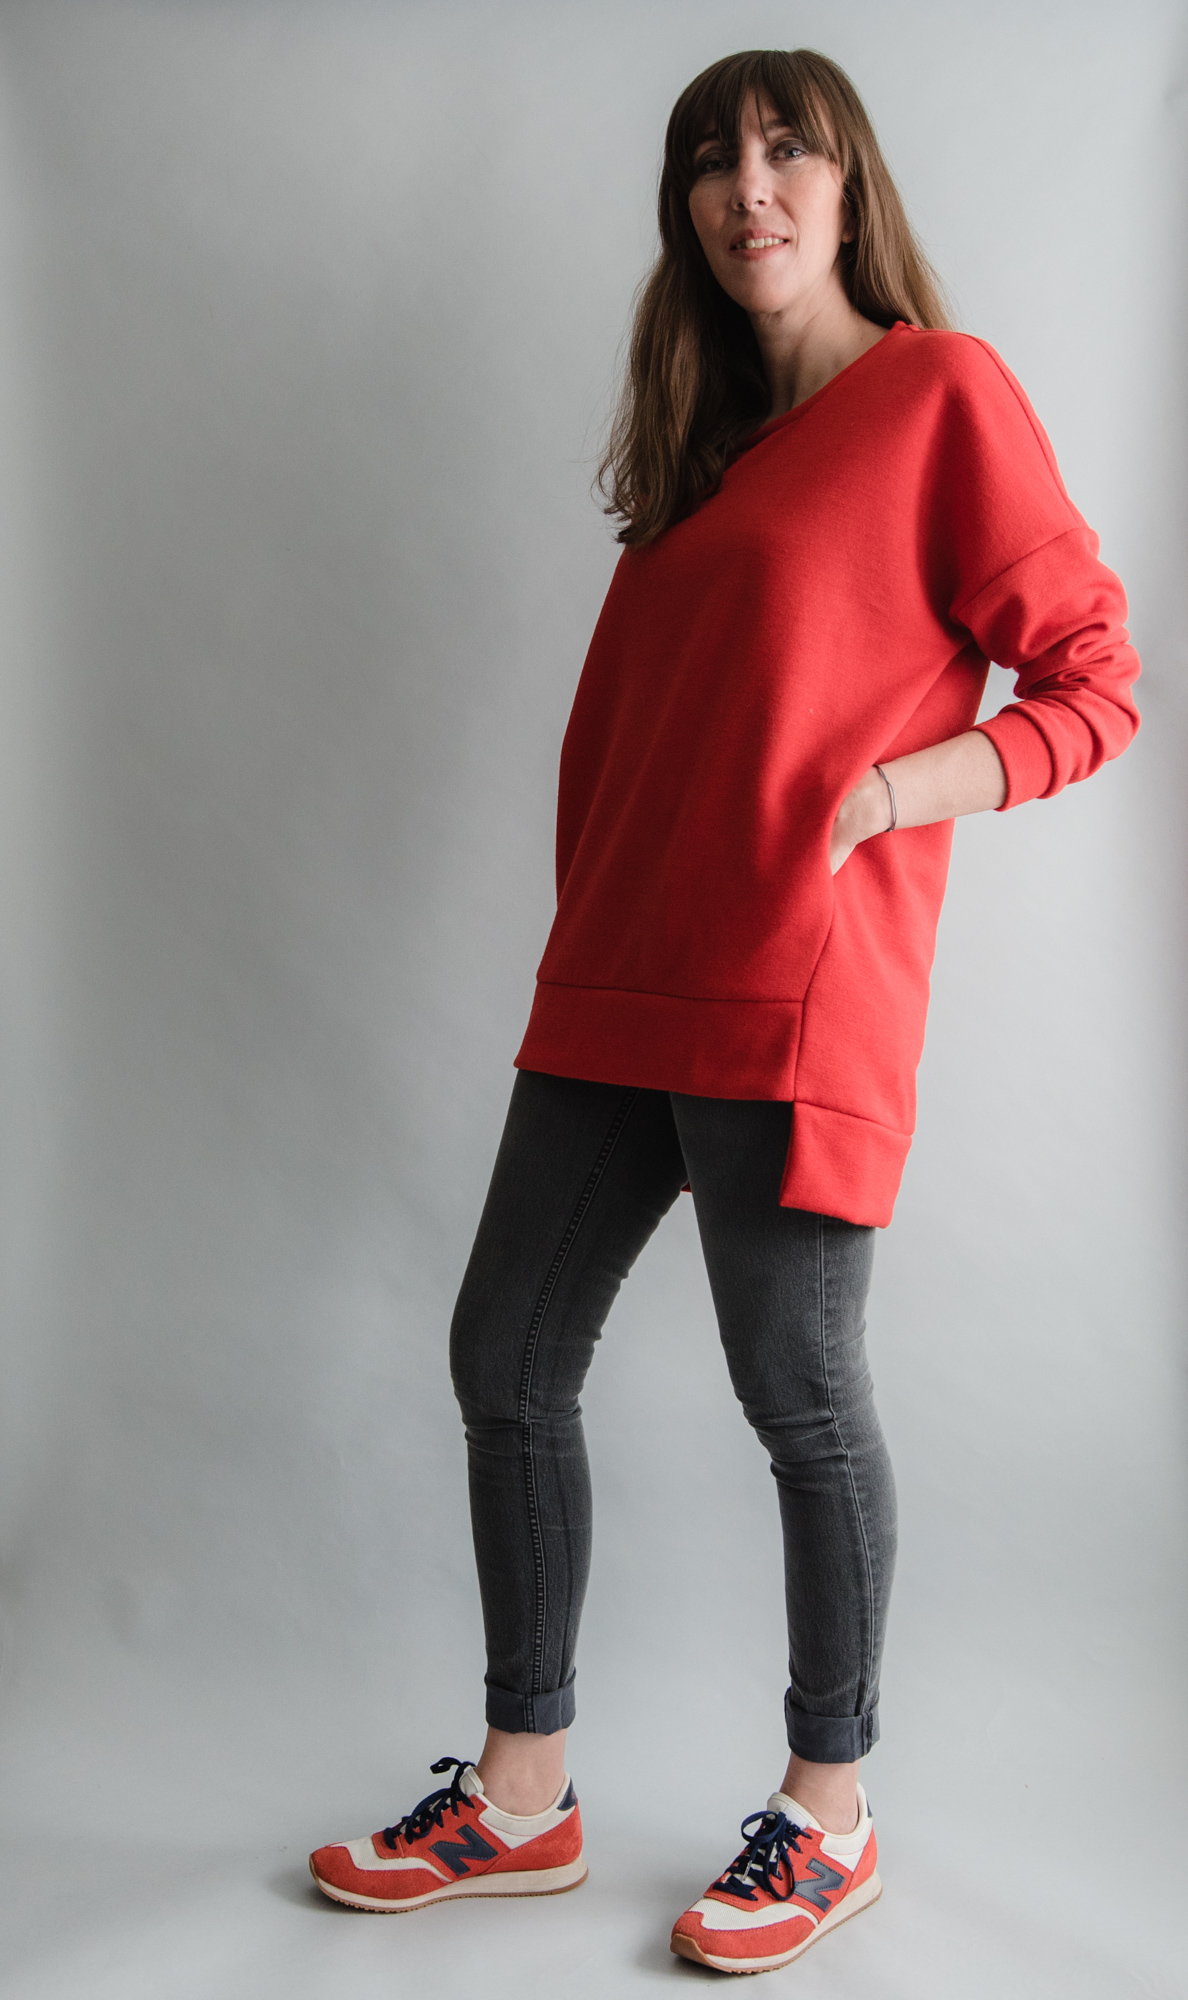 sunday+everyday+sweater+mid01.jpg